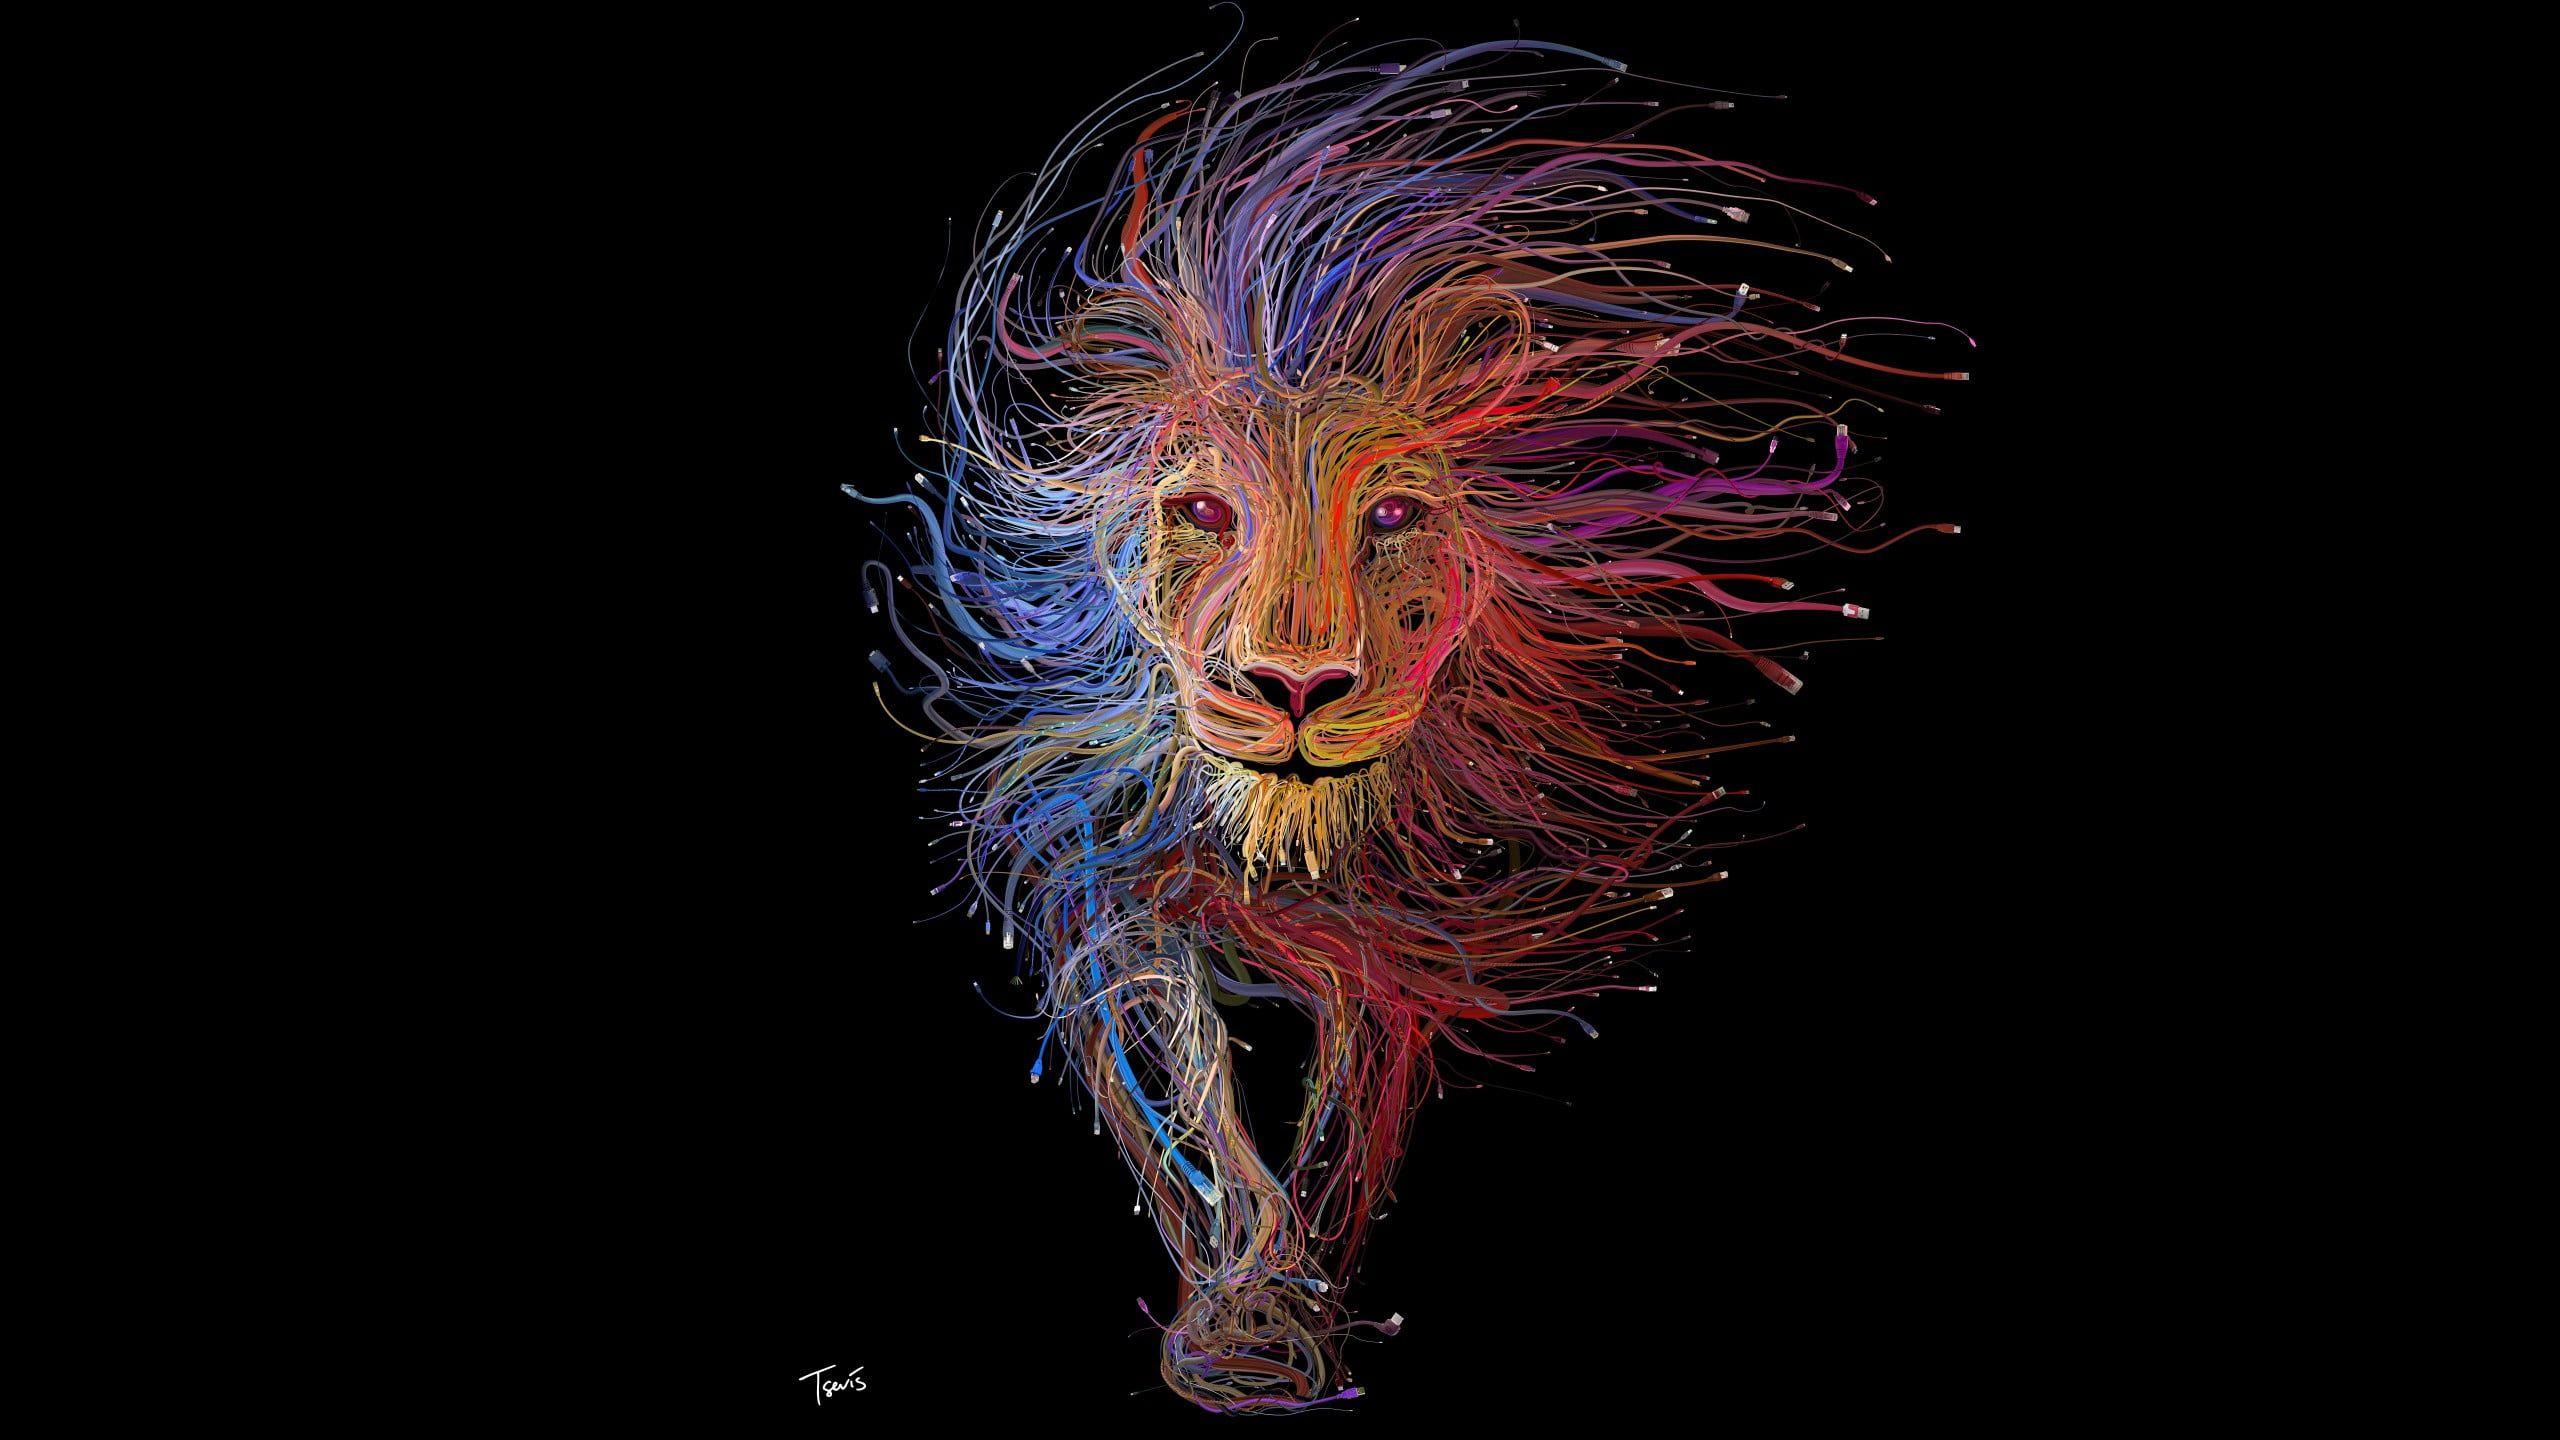 Red Blue And Orange Multi Color Lion Illustration Multicolored Lion Artwork Wallpaper Lion Colorful Digit Lion Hd Wallpaper Lion Artwork Lion Illustration